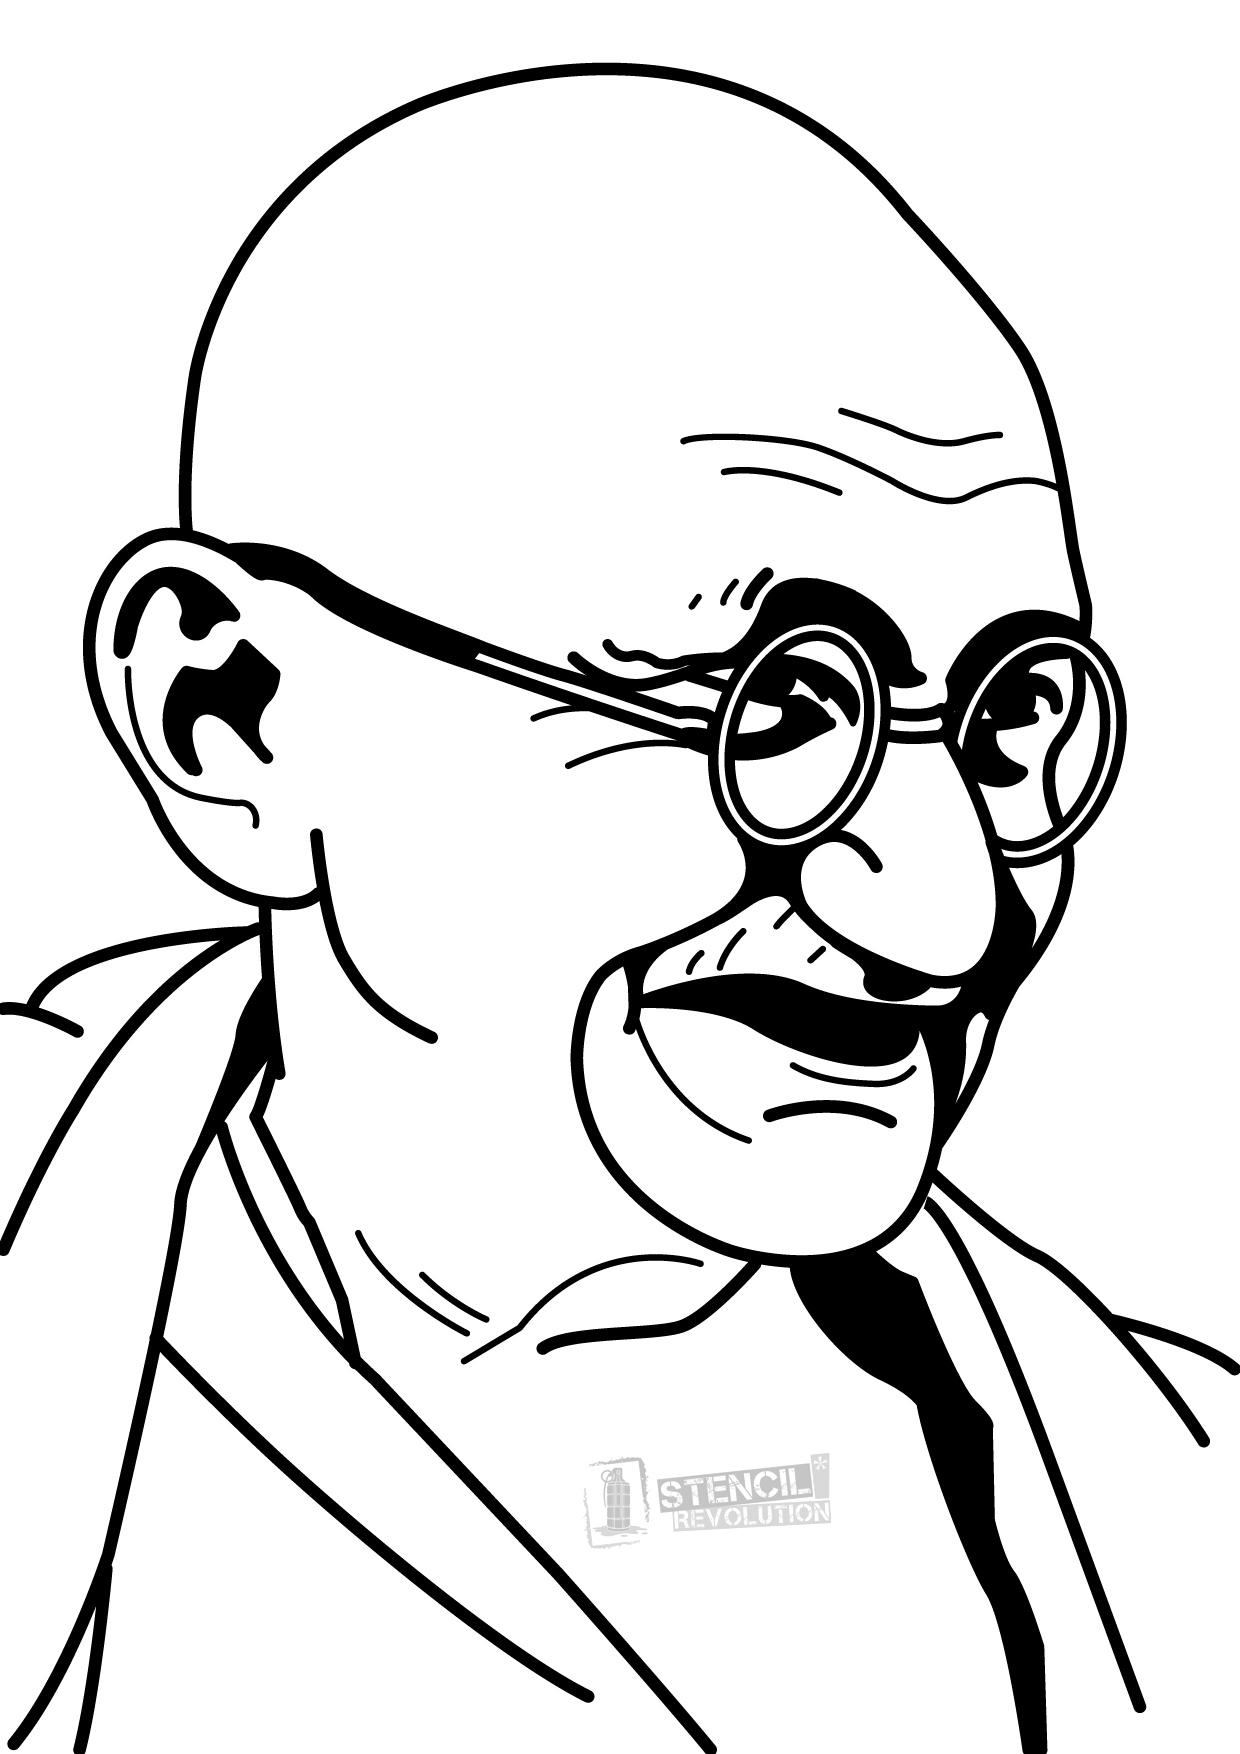 Goku pencil drawing free download best goku pencil drawing